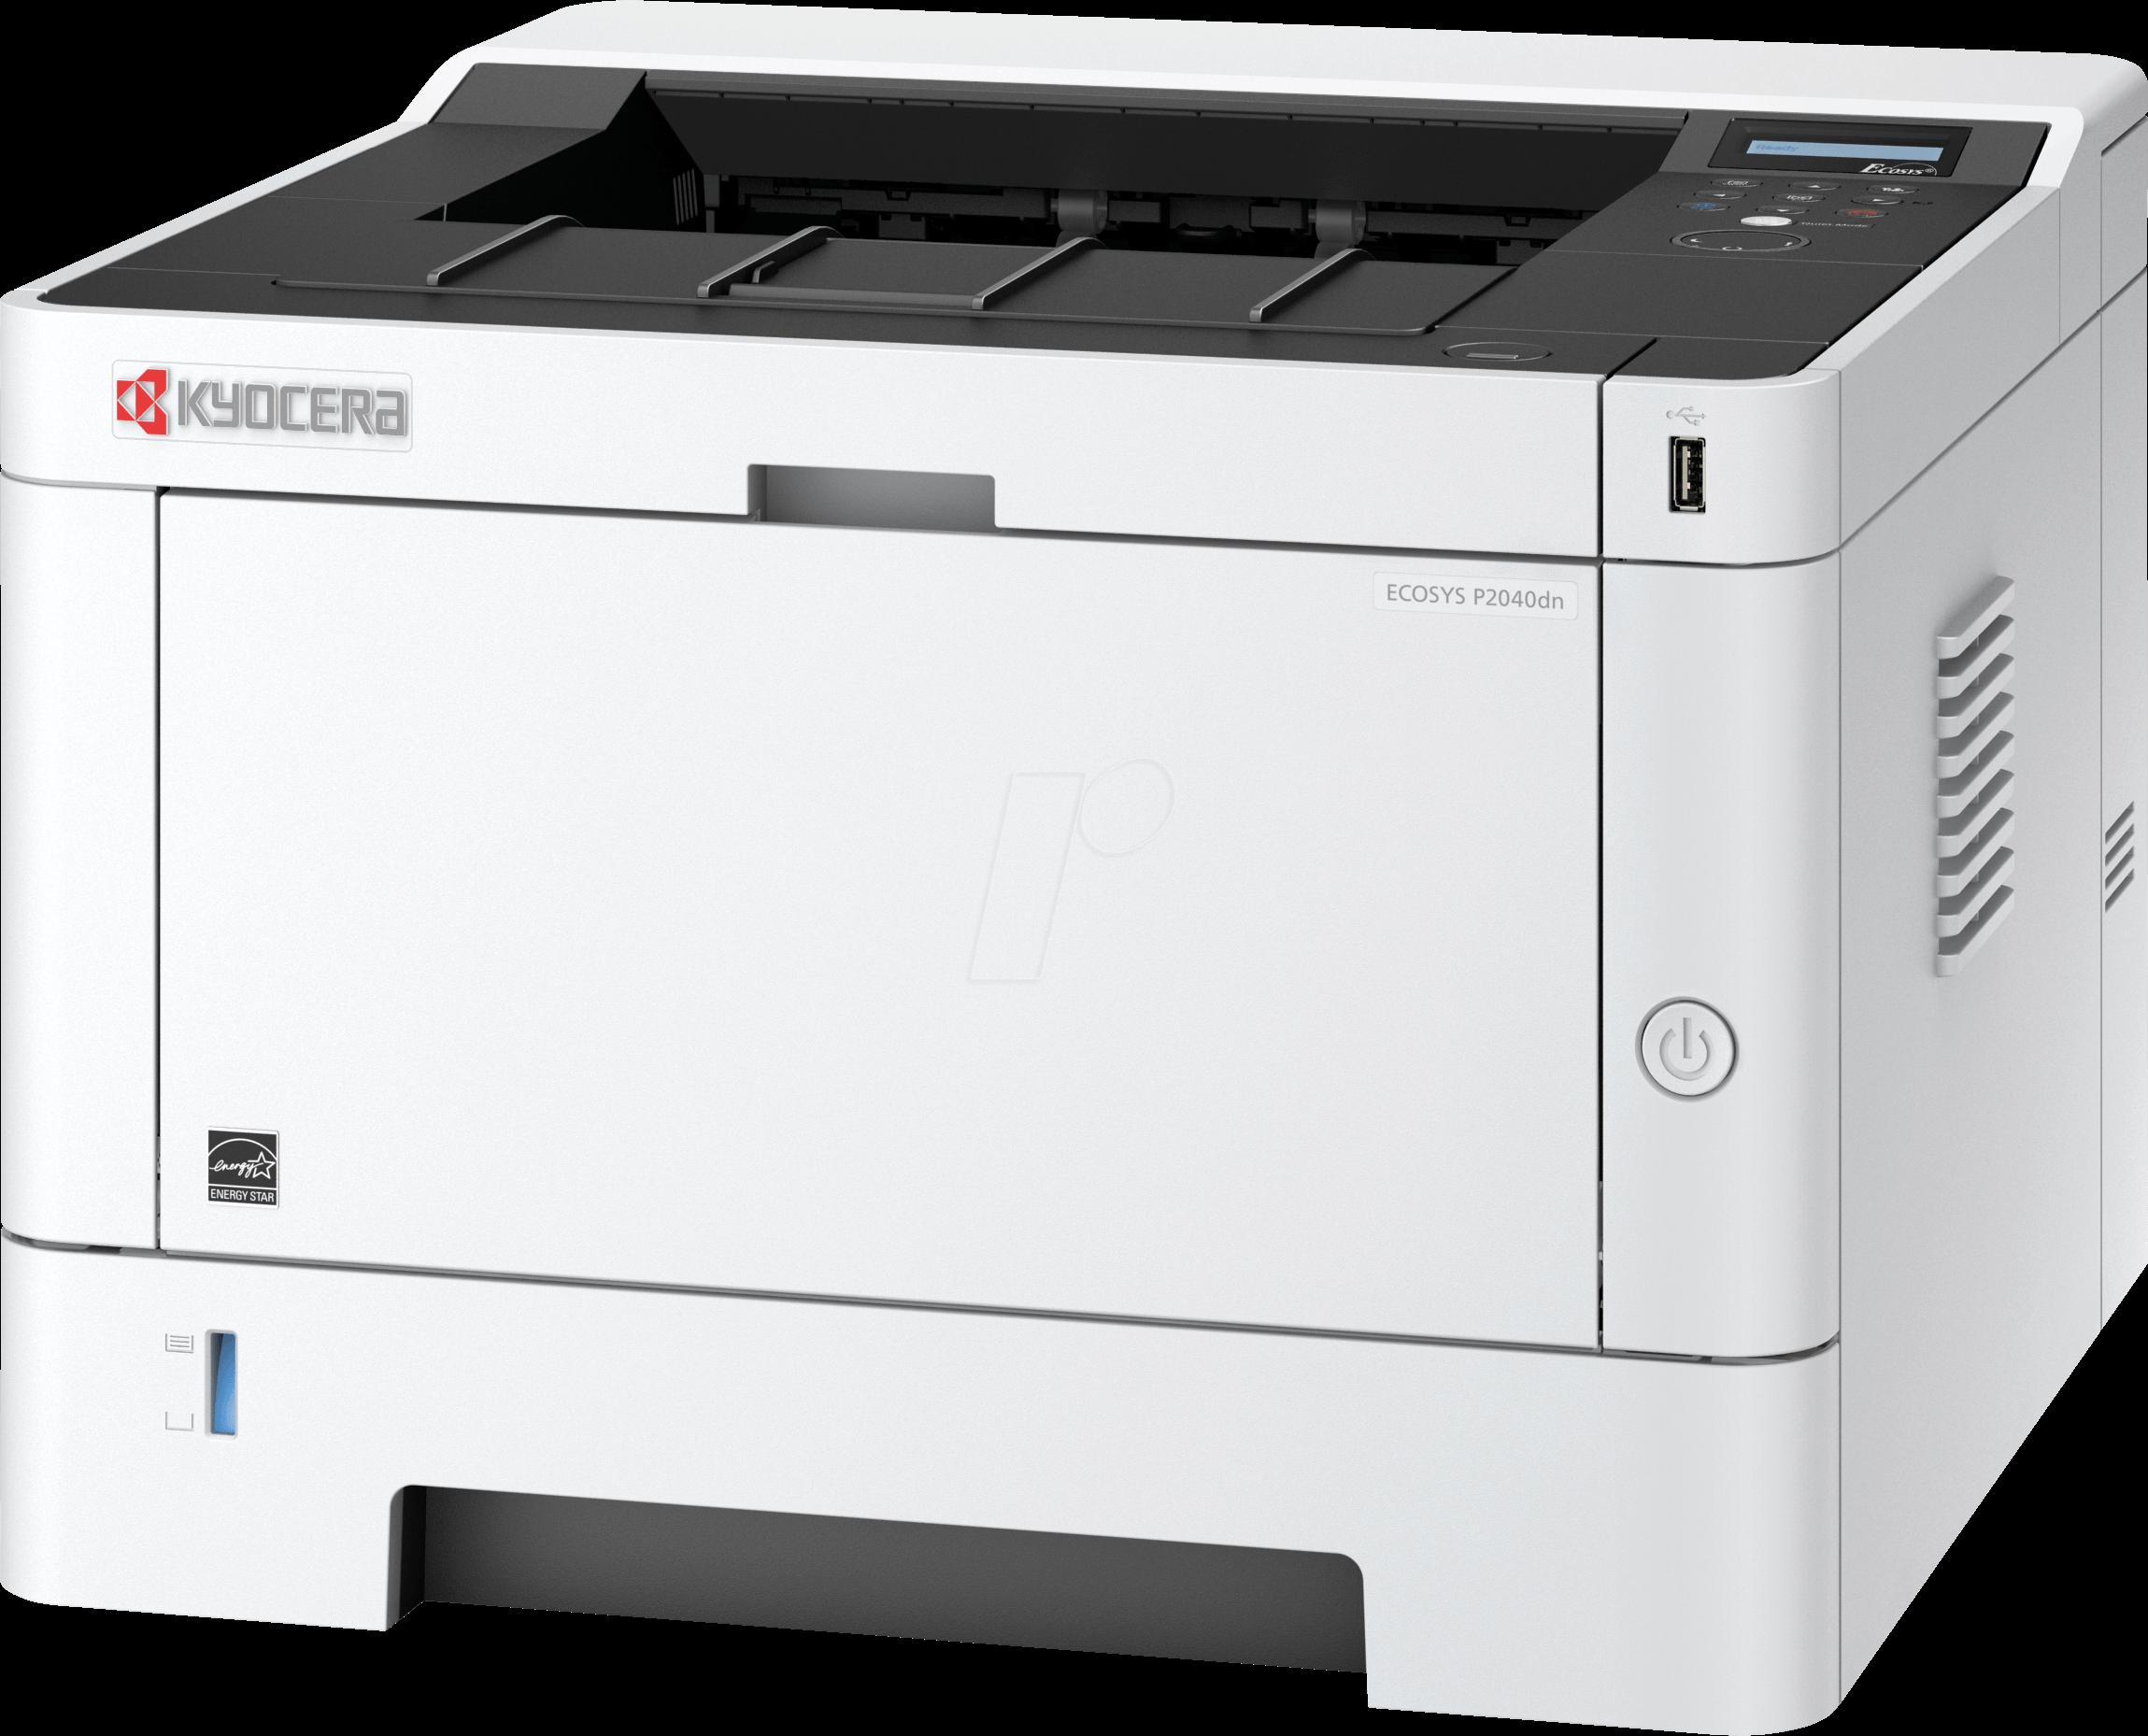 Kyocera ECOSYS P2040DN Drucker, Laser, monochrom, 40 S min, LAN, Duplex, inkl. UHGServi